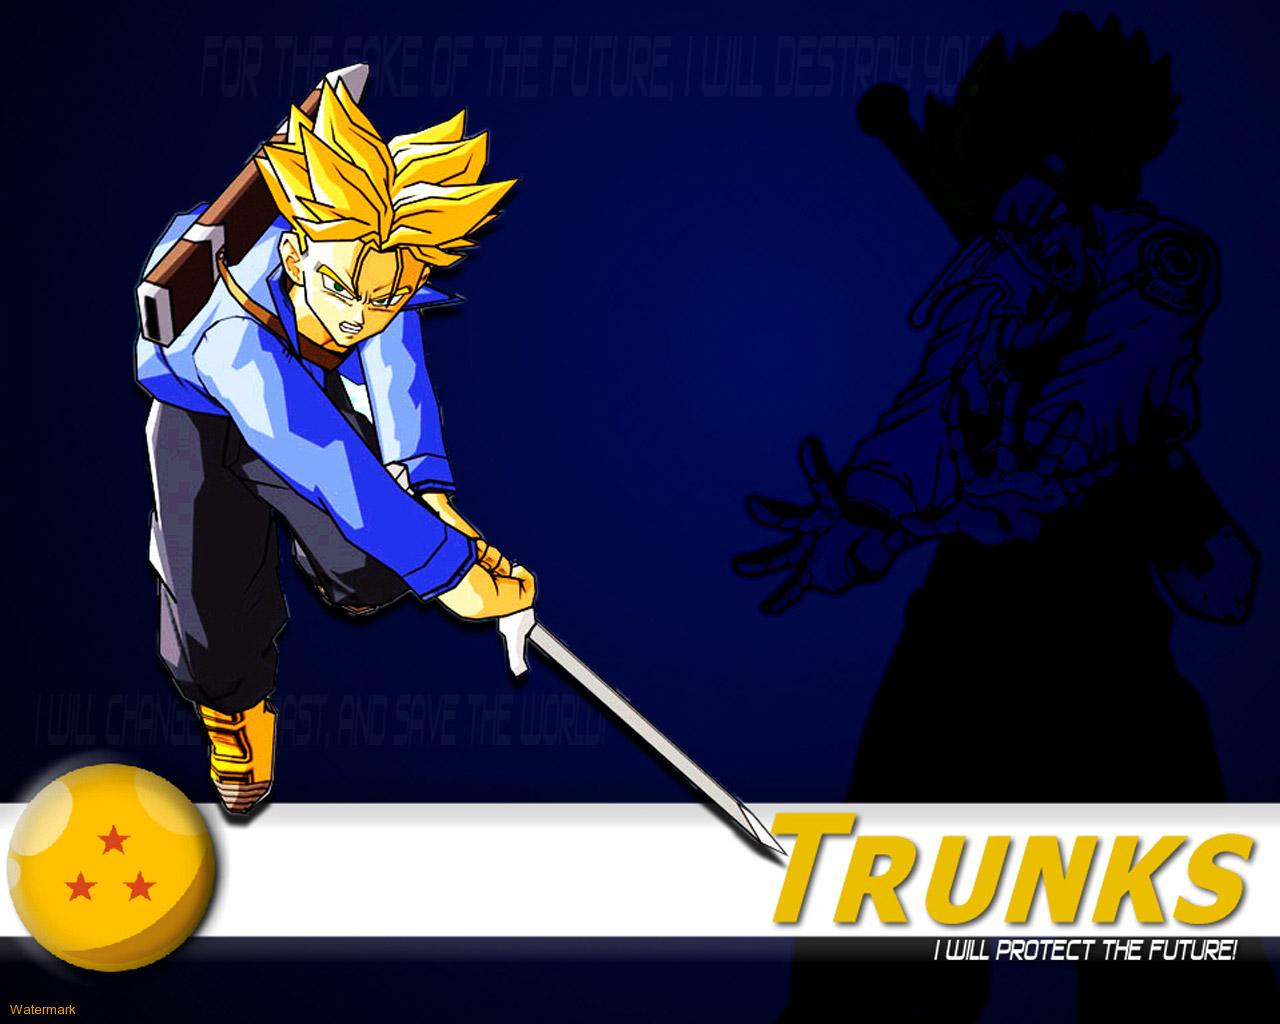 Download Trunks wallpaper trunks 1280x1024